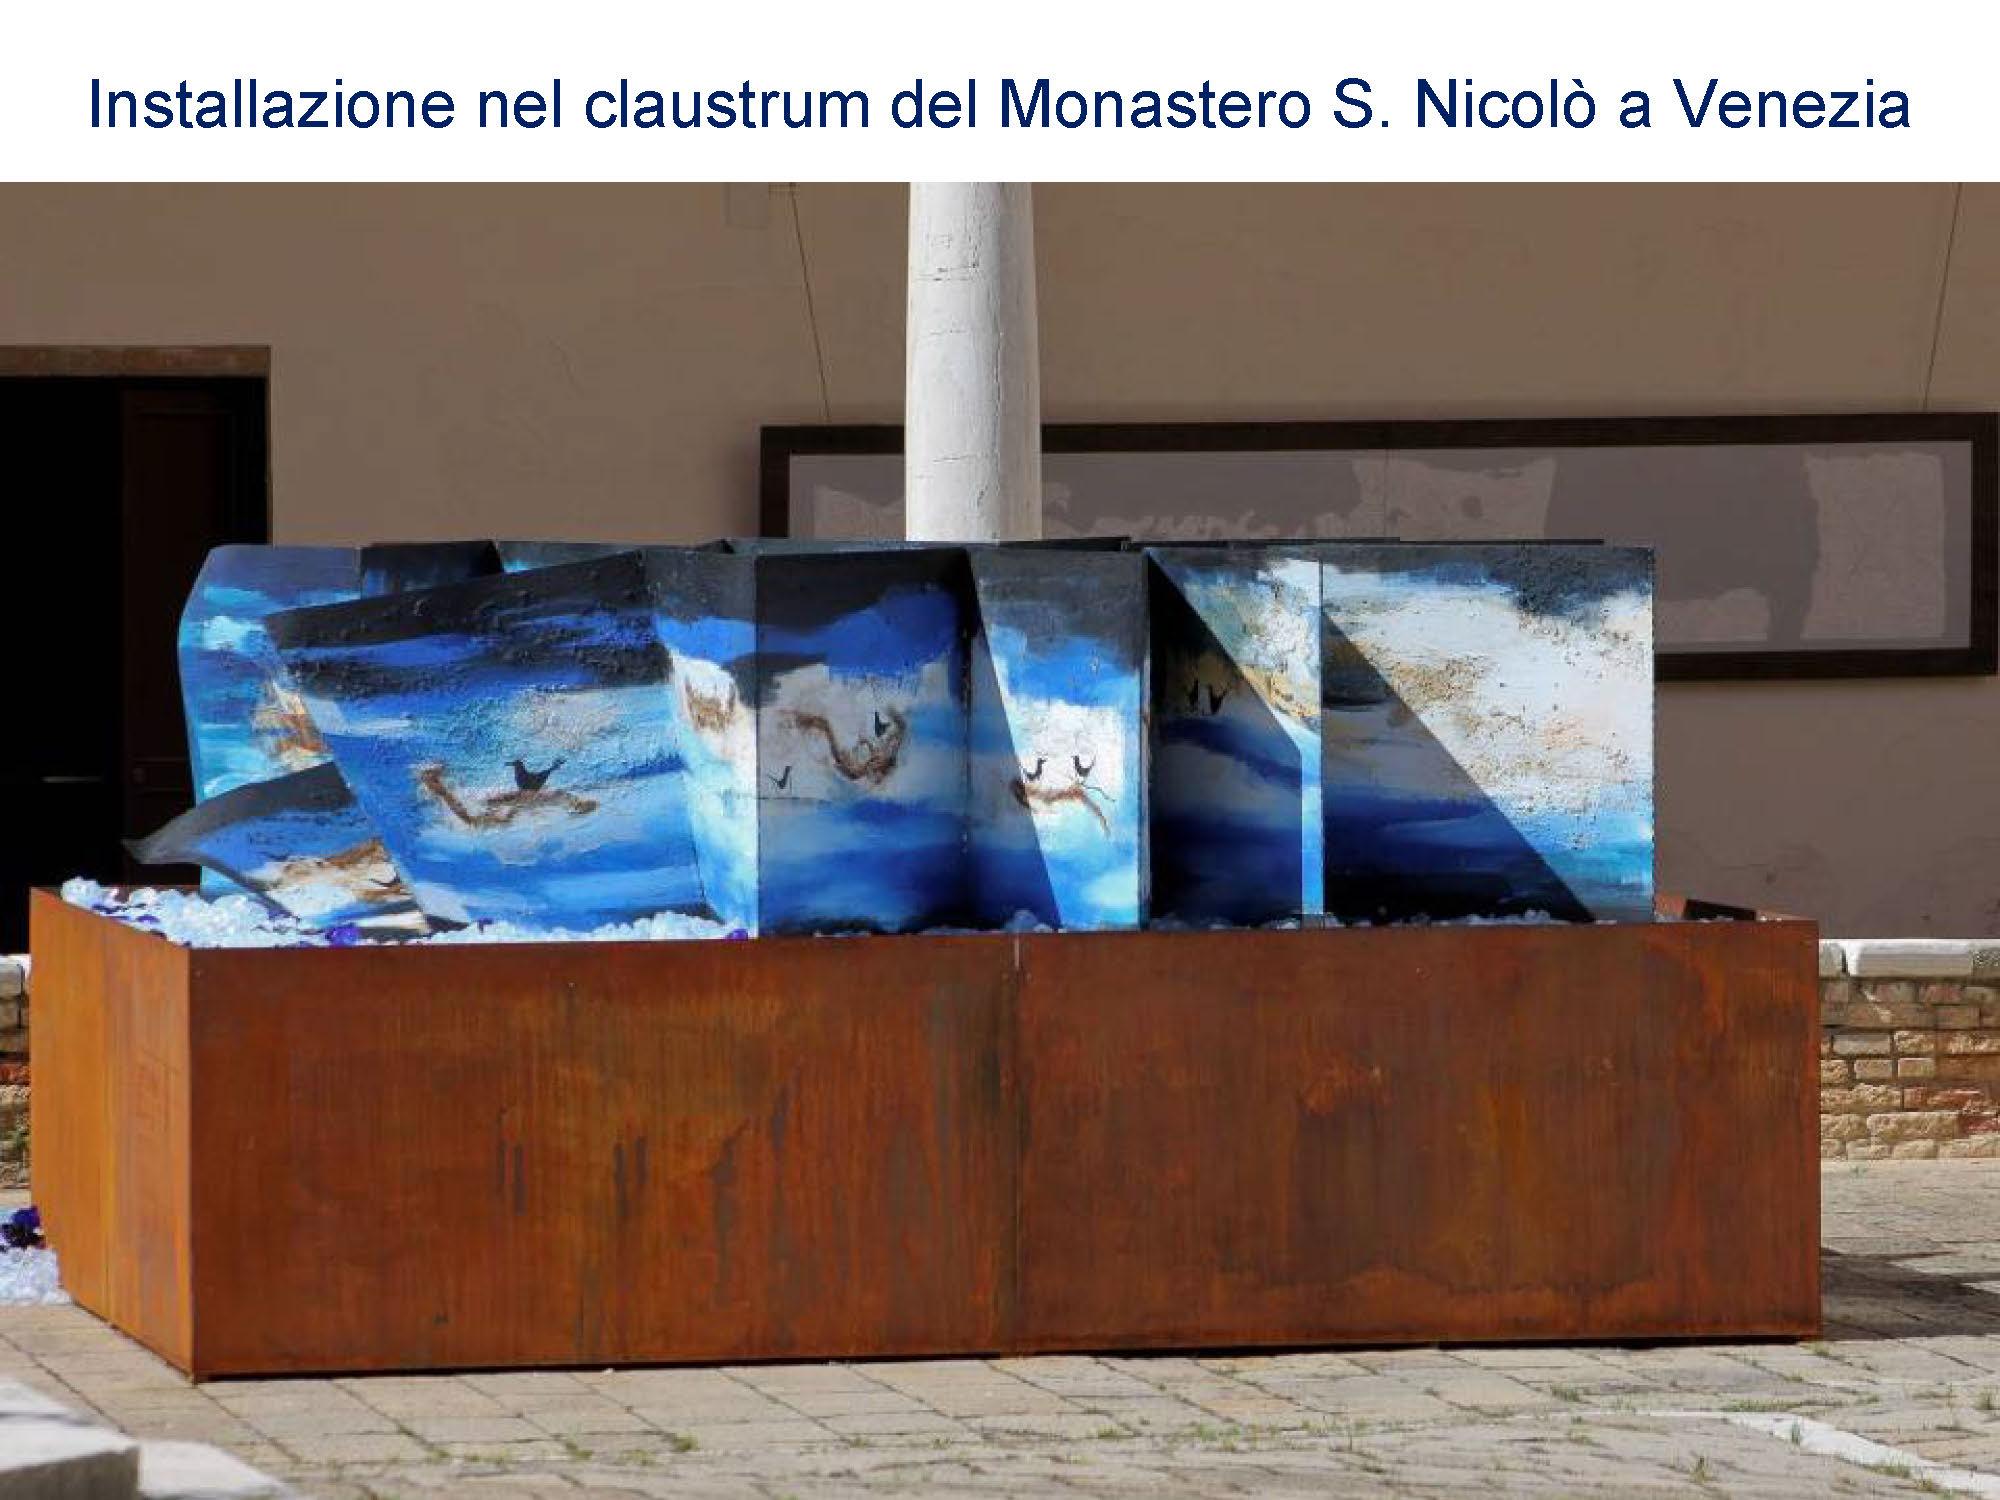 Presentazione Antonio NoceraOriginale_Pagina_07